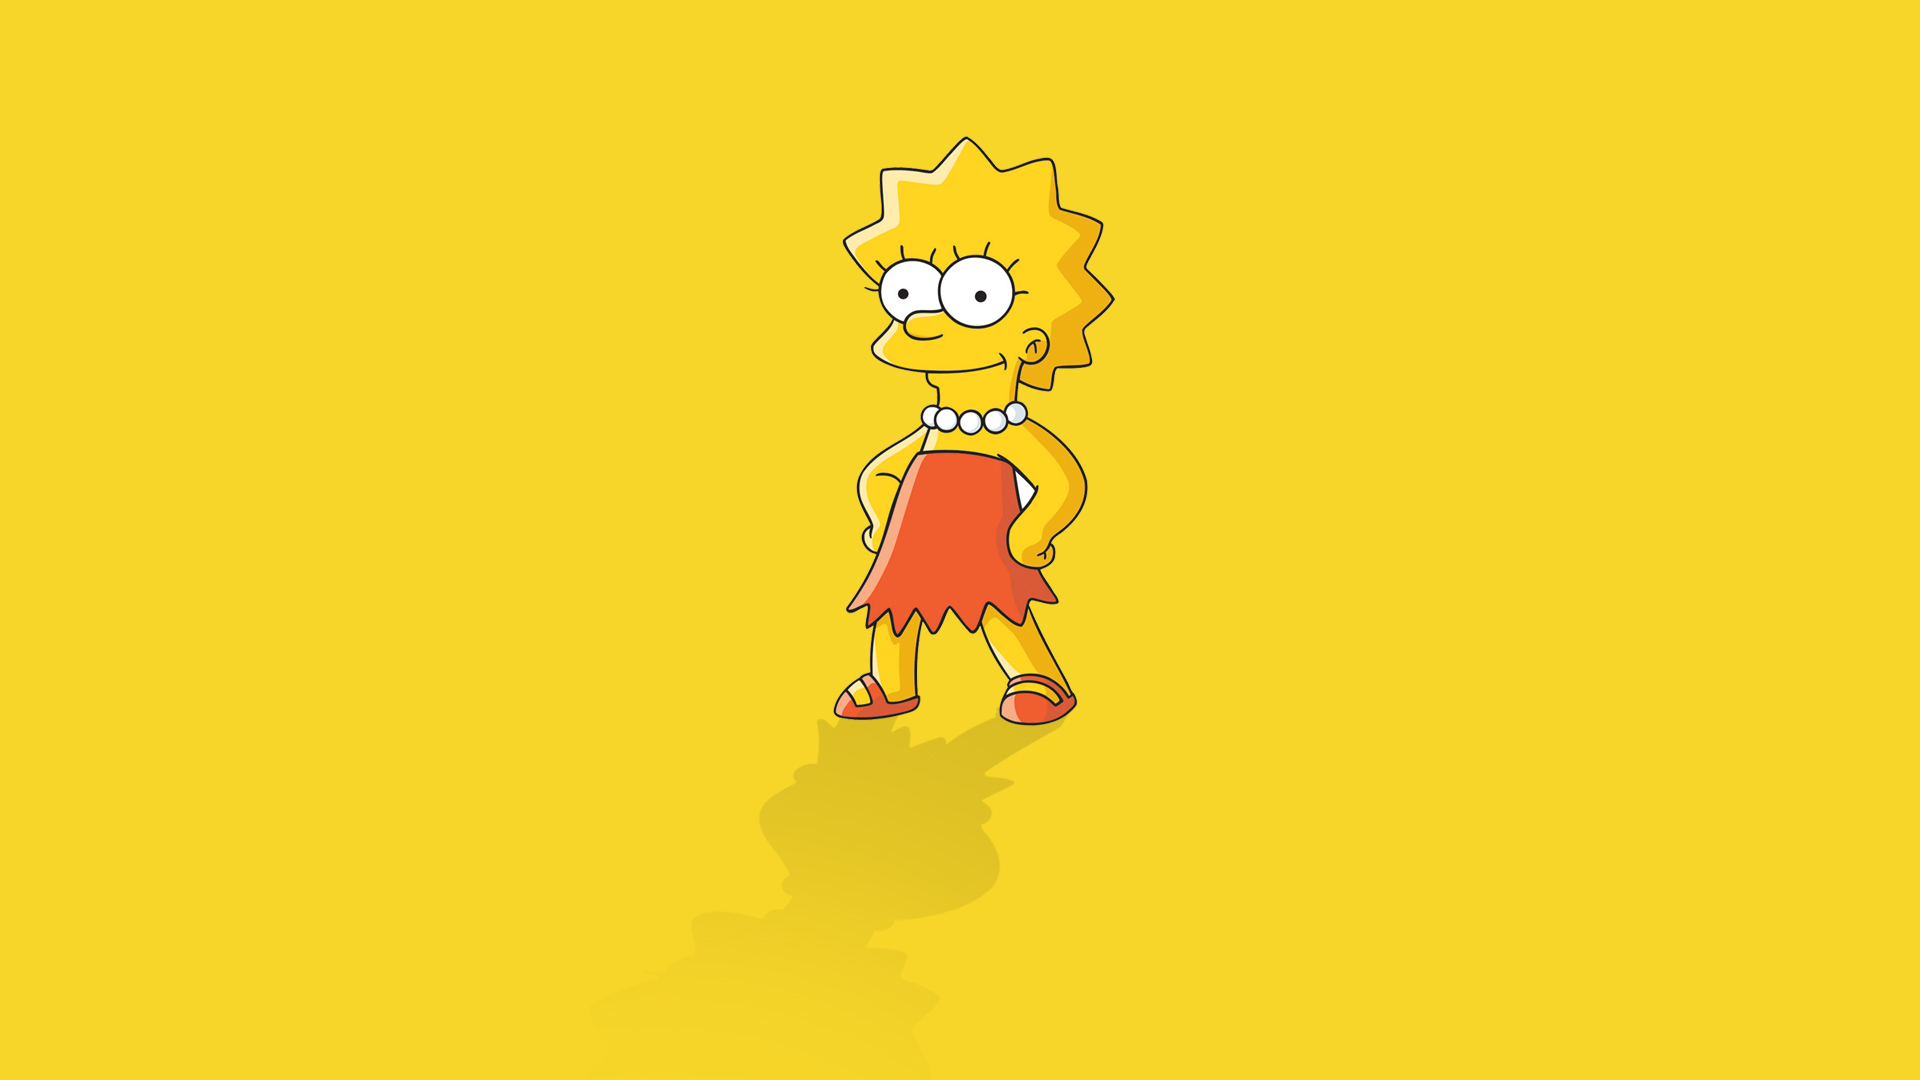 Les Simpsons Fond D Ecran Hd Arriere Plan 1920x1080 Id